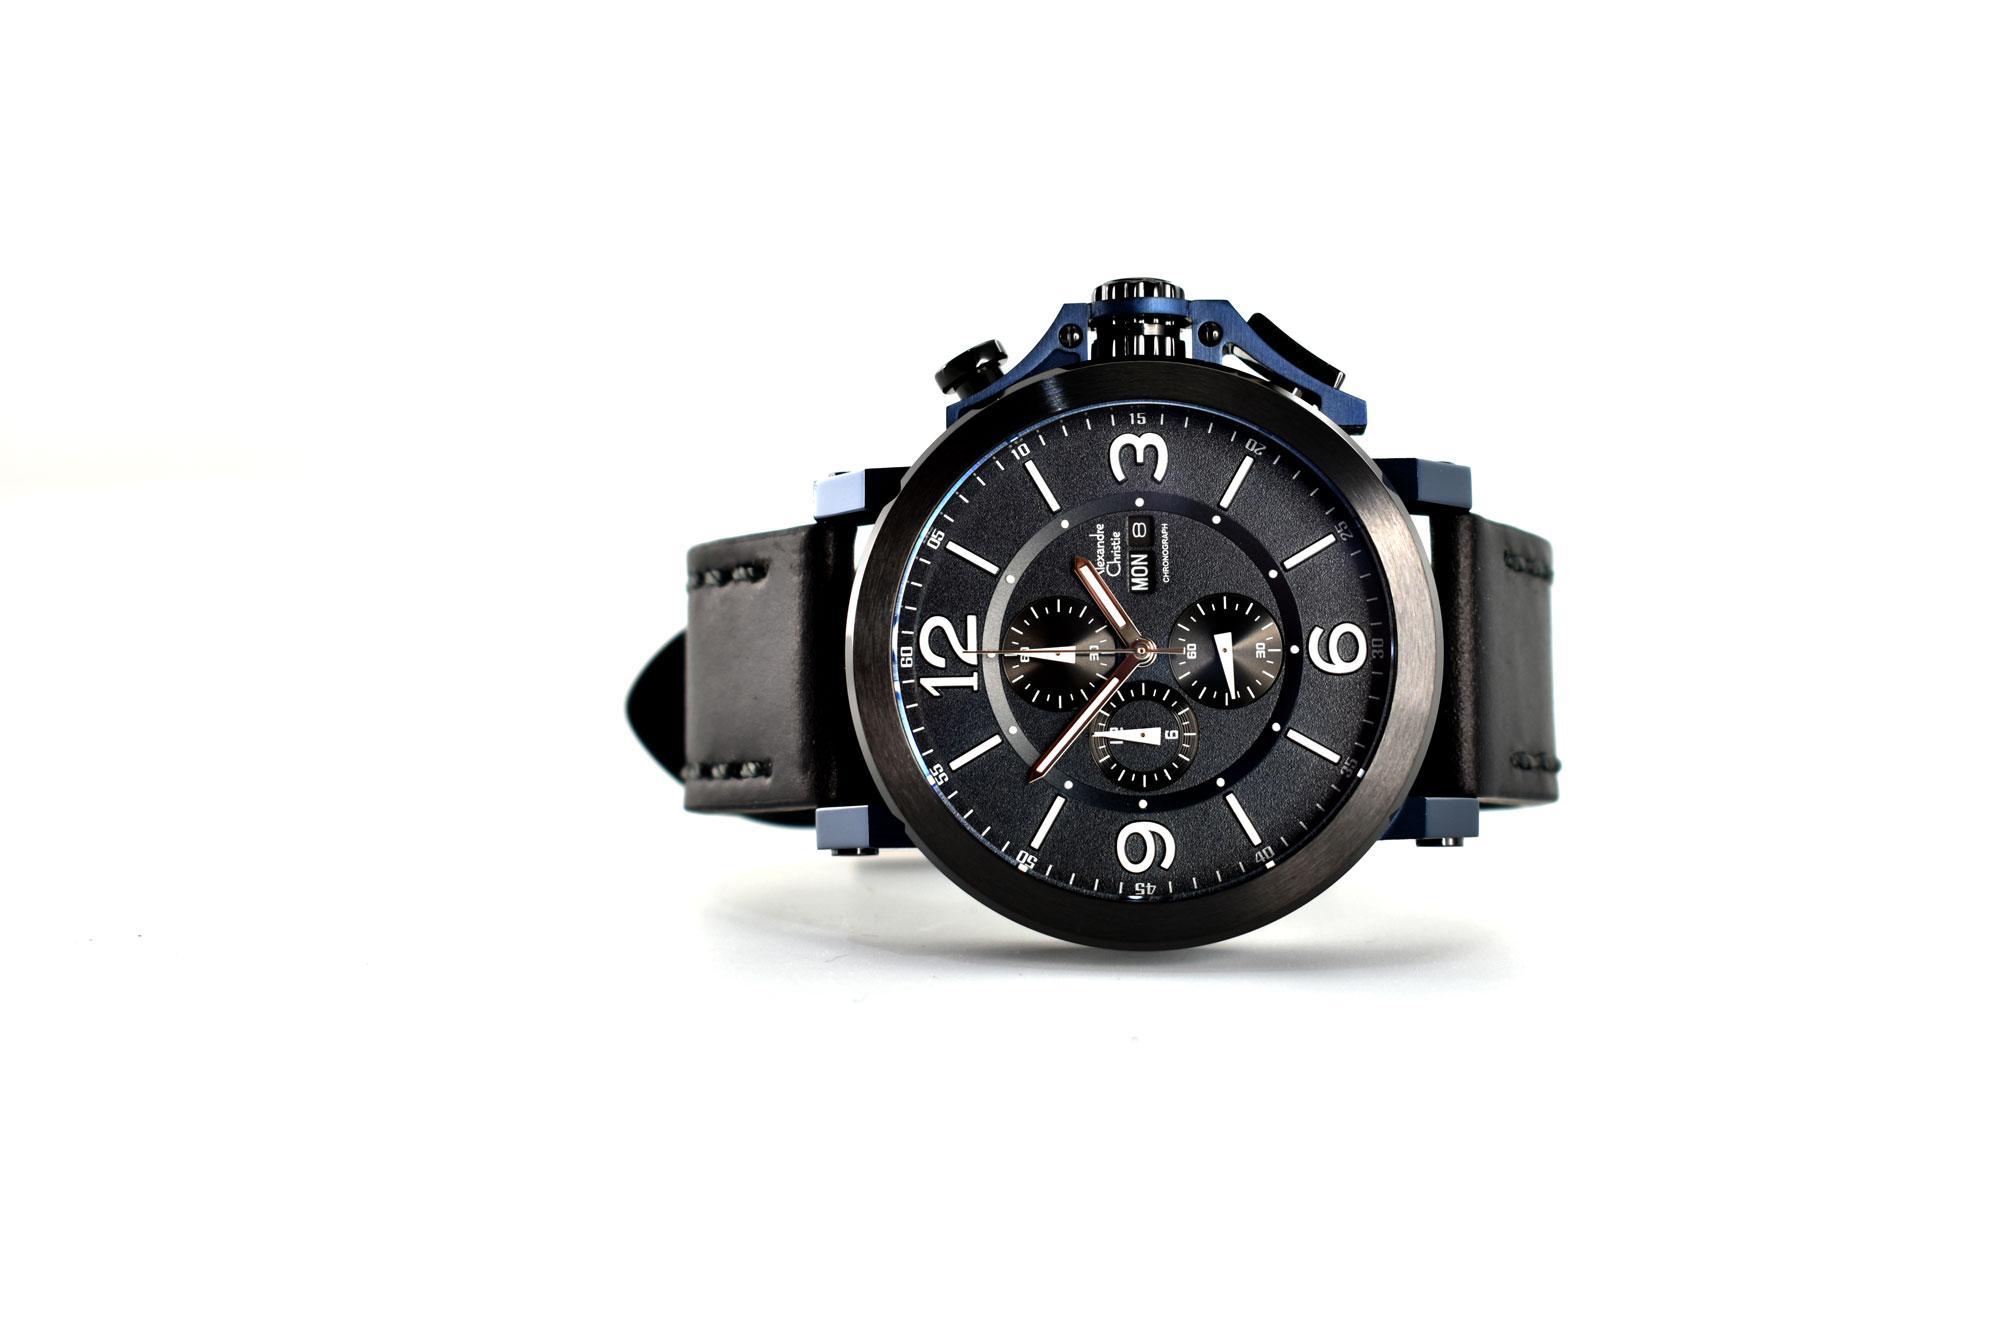 Kelebihan Alexandre Christie Ac 6281 Chronograph Jam Tangan Pria Ac6281 Original Black Tali Kulit Case Stainless Steel 2